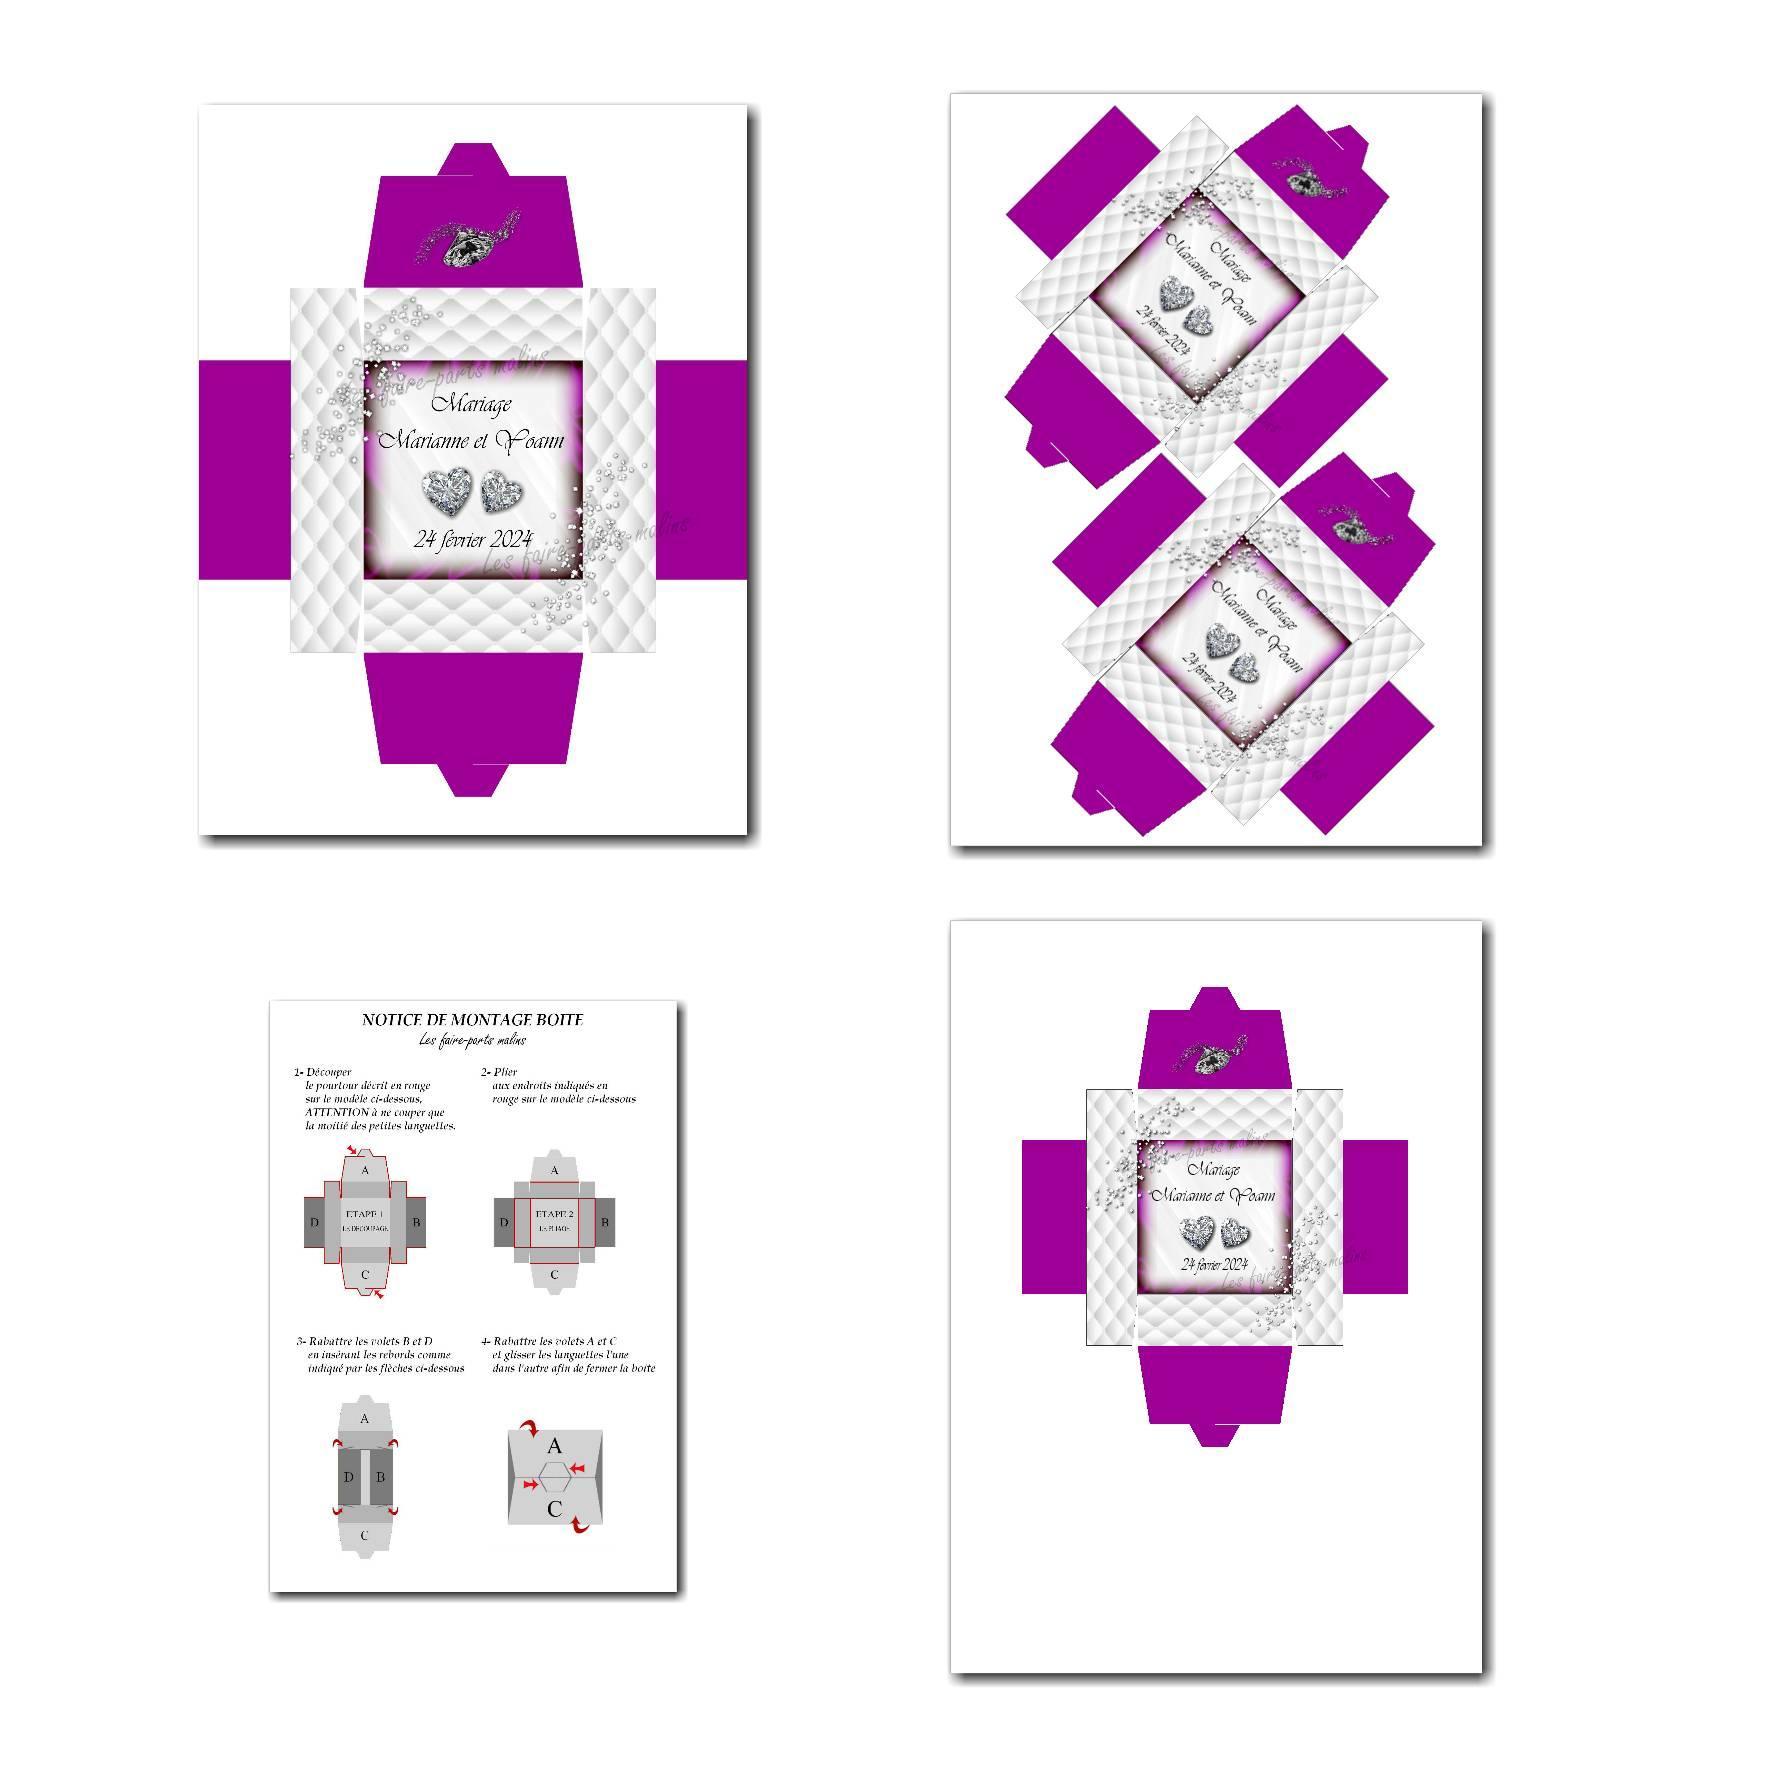 Pai 40 mariage violet boite